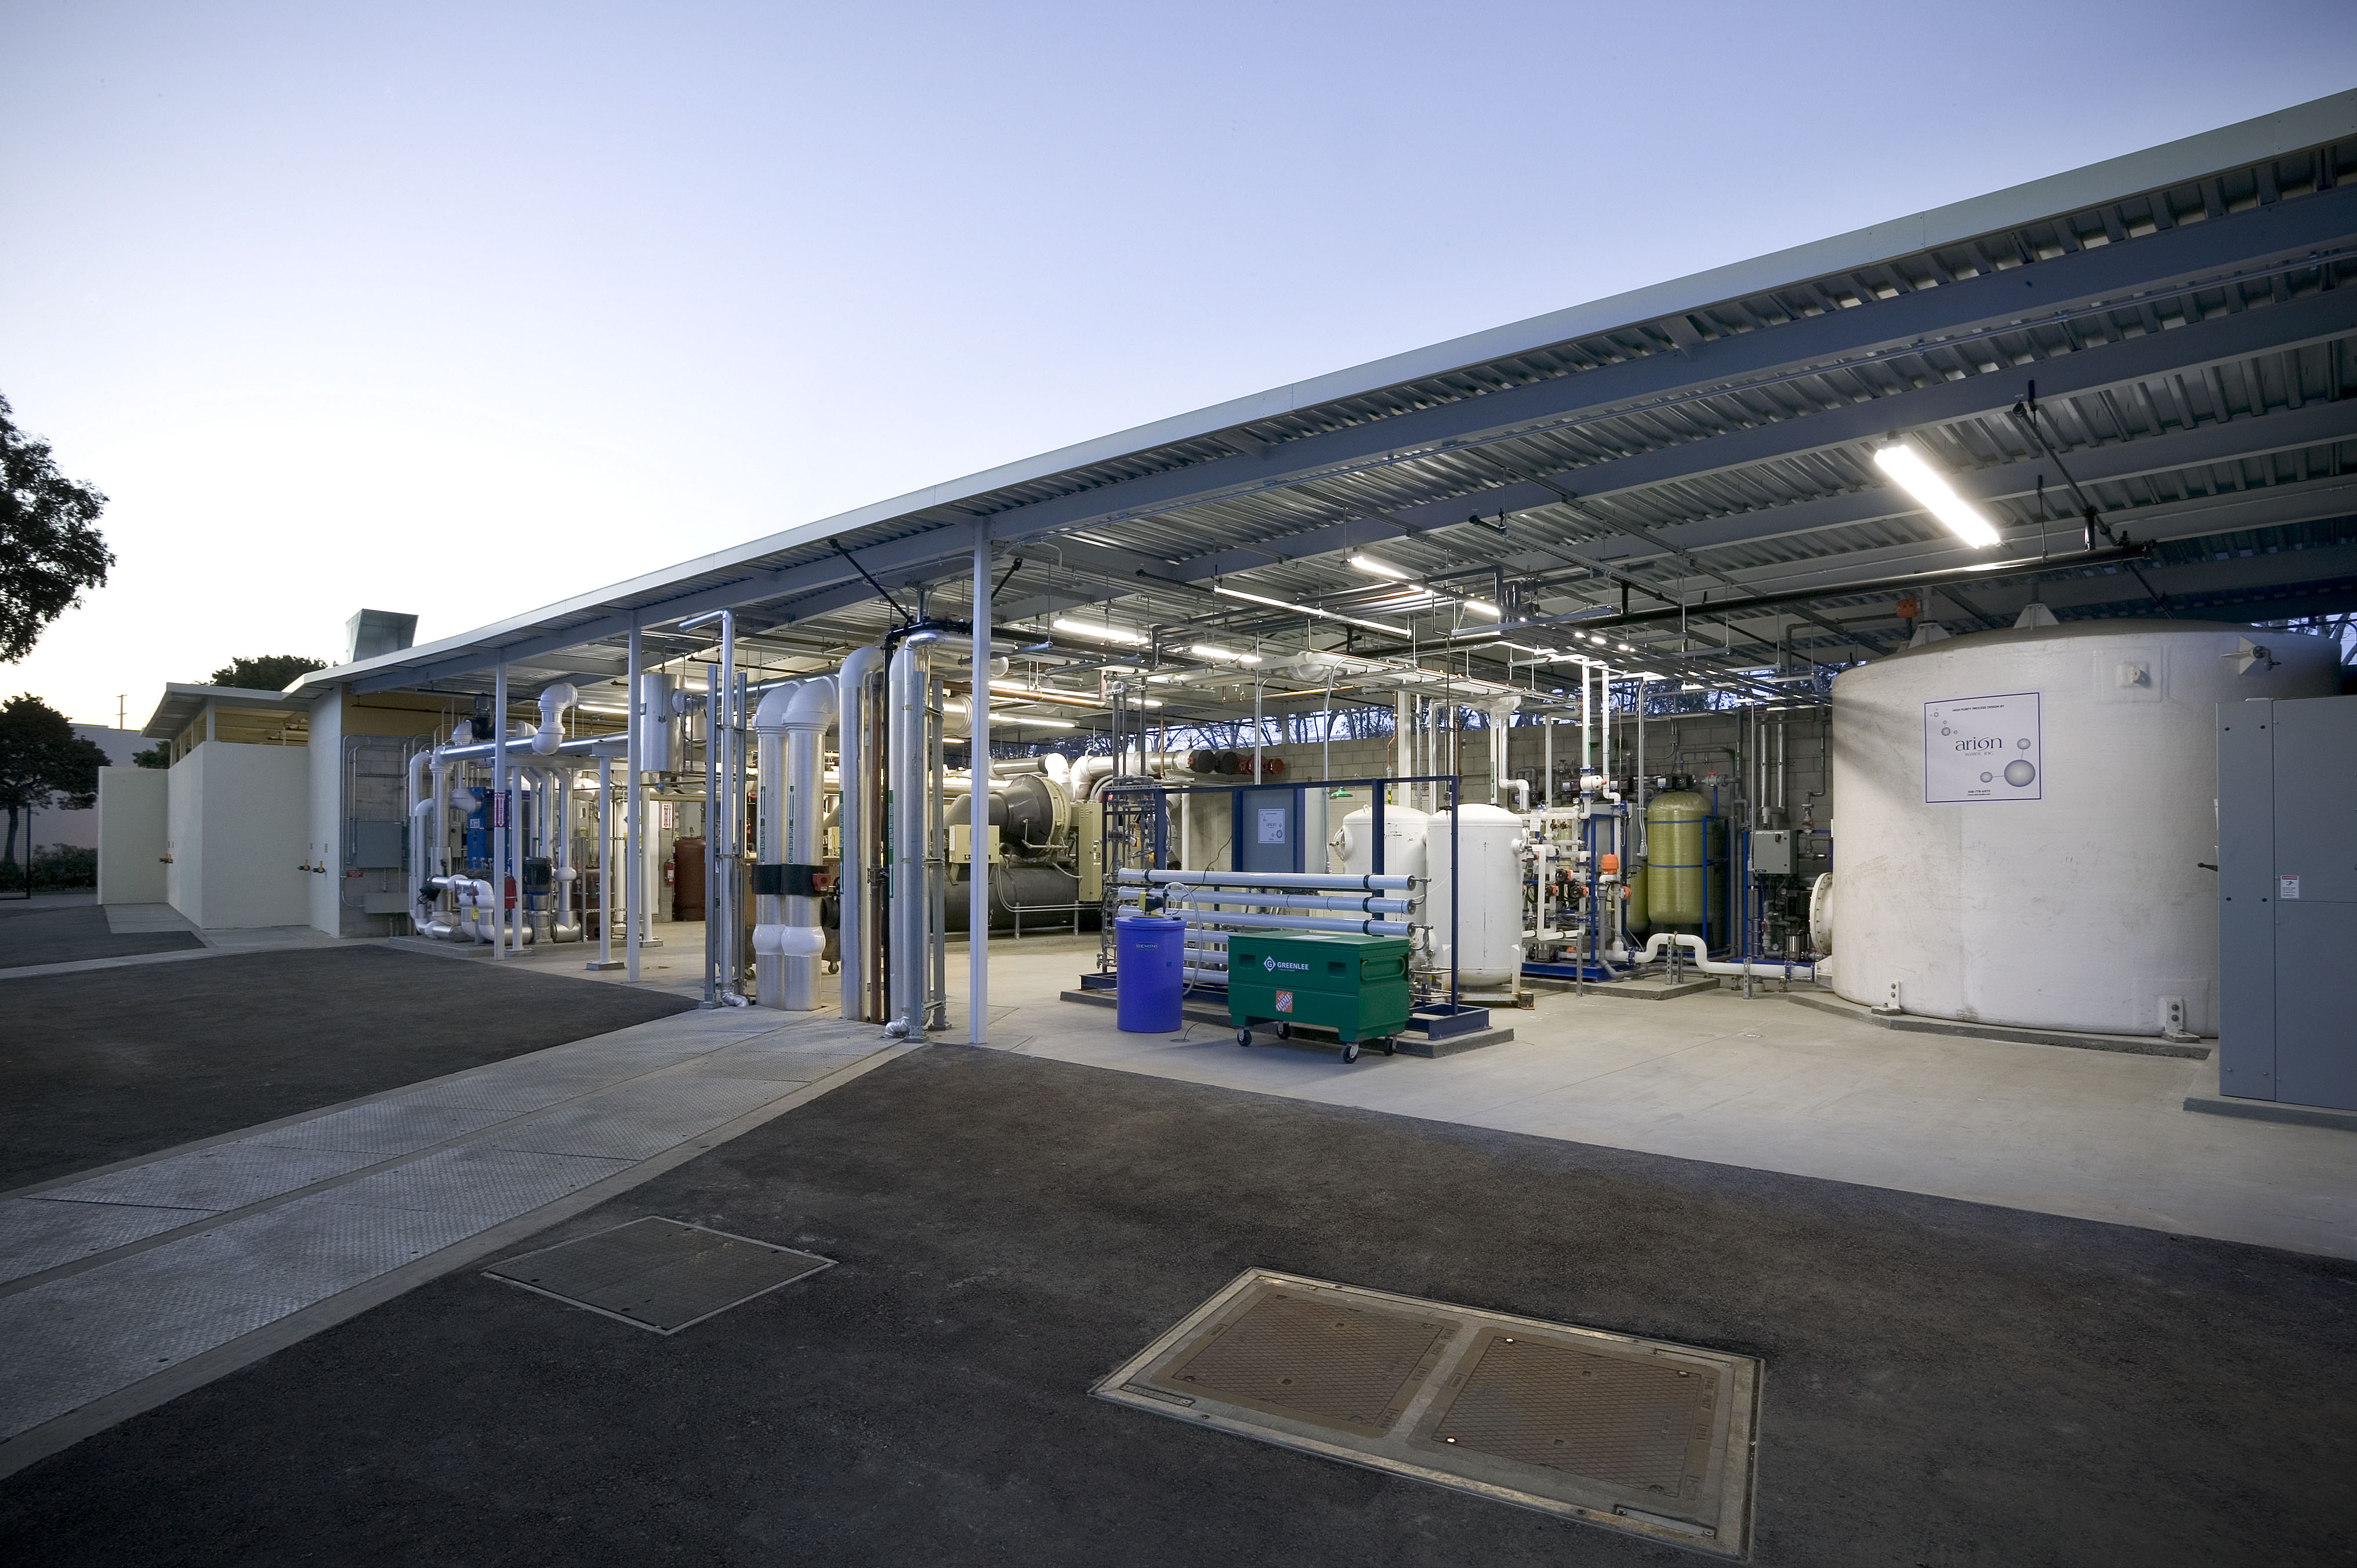 Qualcomm, San Jose, CA Client: Devel Construction, San Jose, CA Delawie Wilkes Rodrigues Barker Architects, San Diego, CA